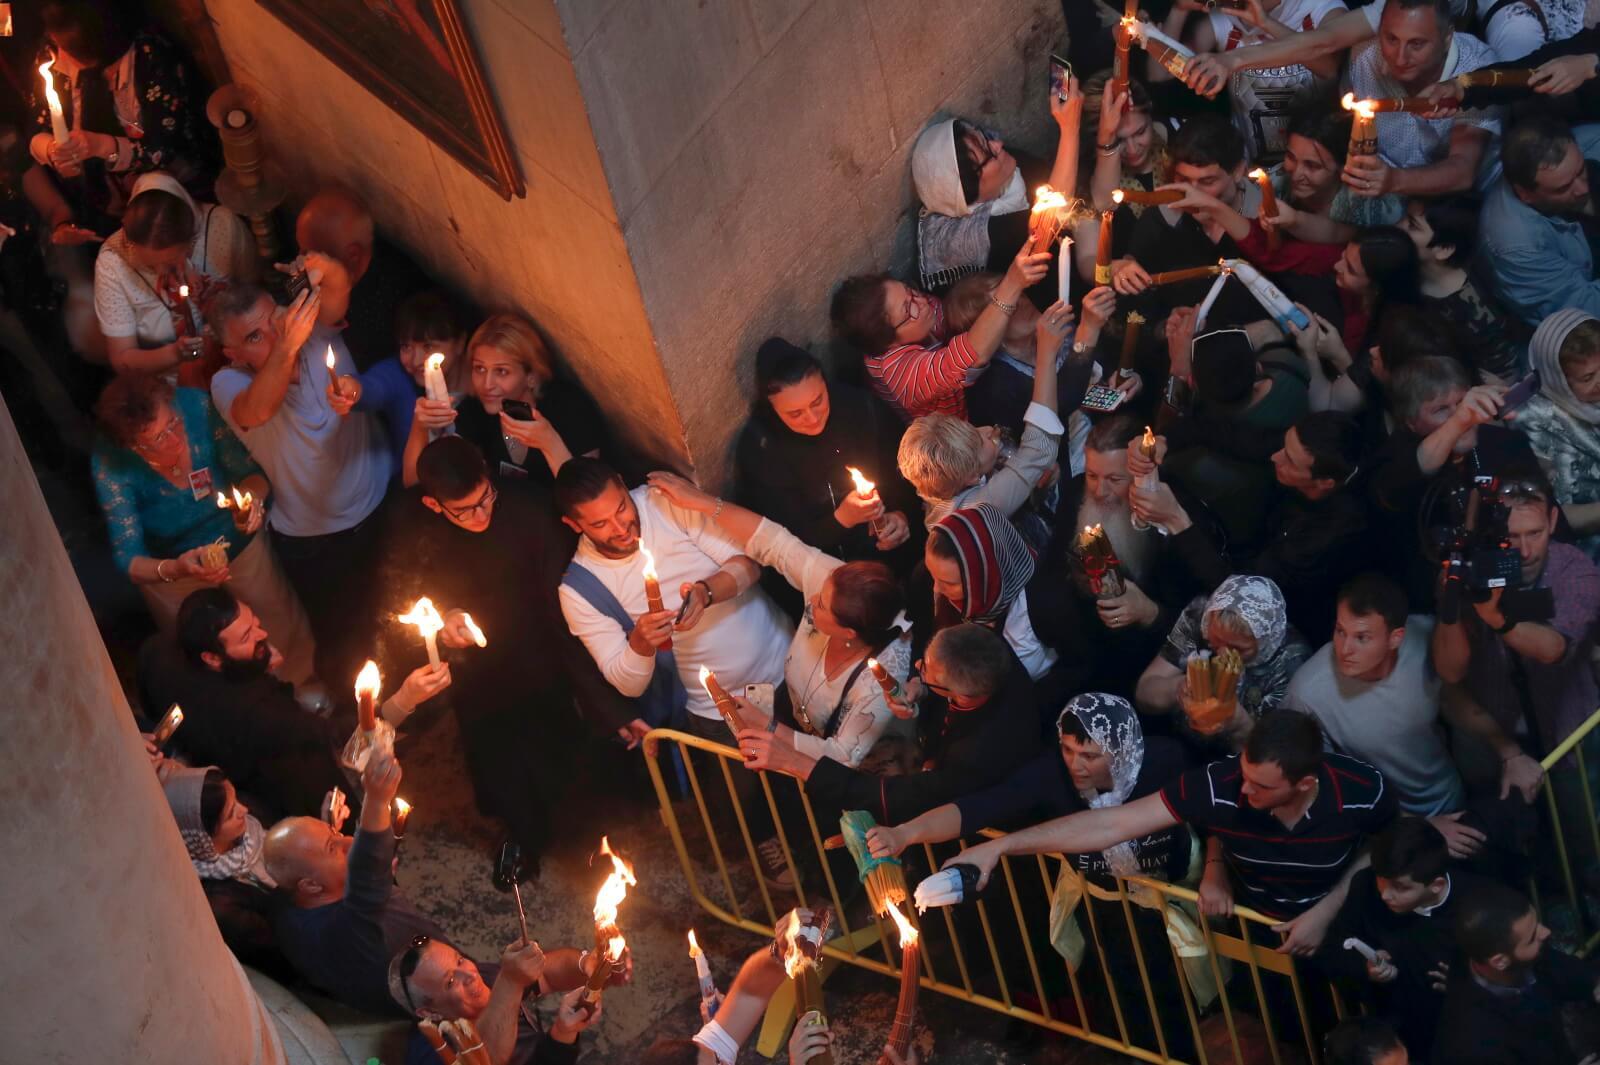 Ceremonia Świętego Ognia fot. EPA/ATEF SAFADI